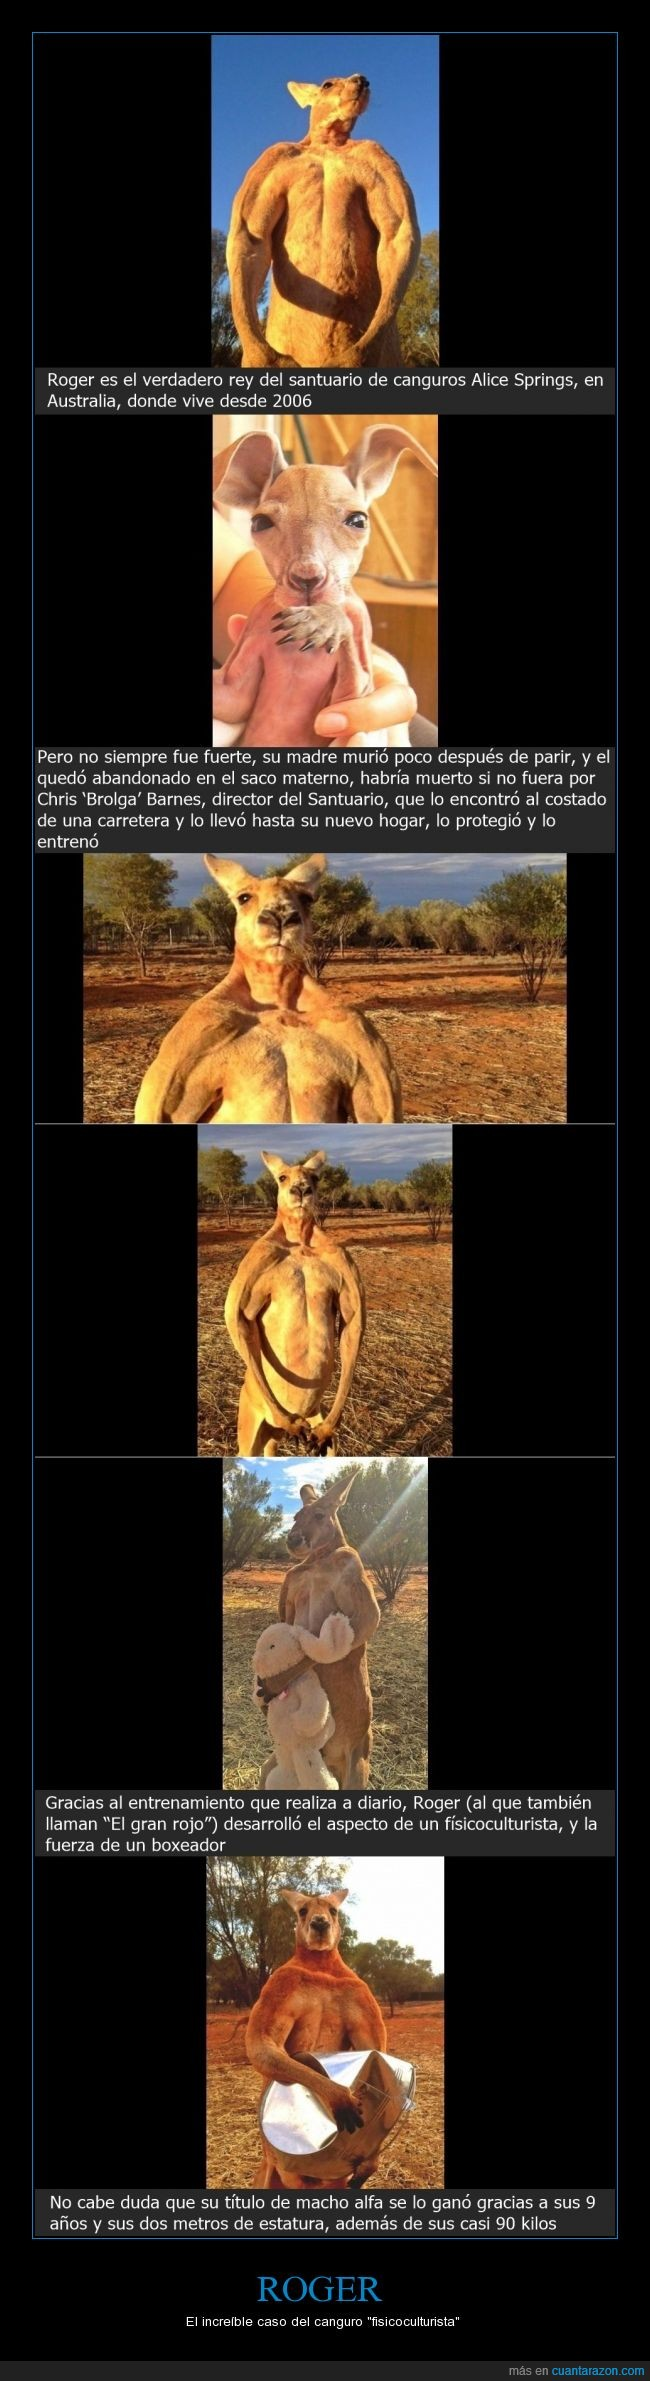 Australia,Canguro,Chris Barnes,fisicoculturista,increíble,Roger,Santuario Alice Springs